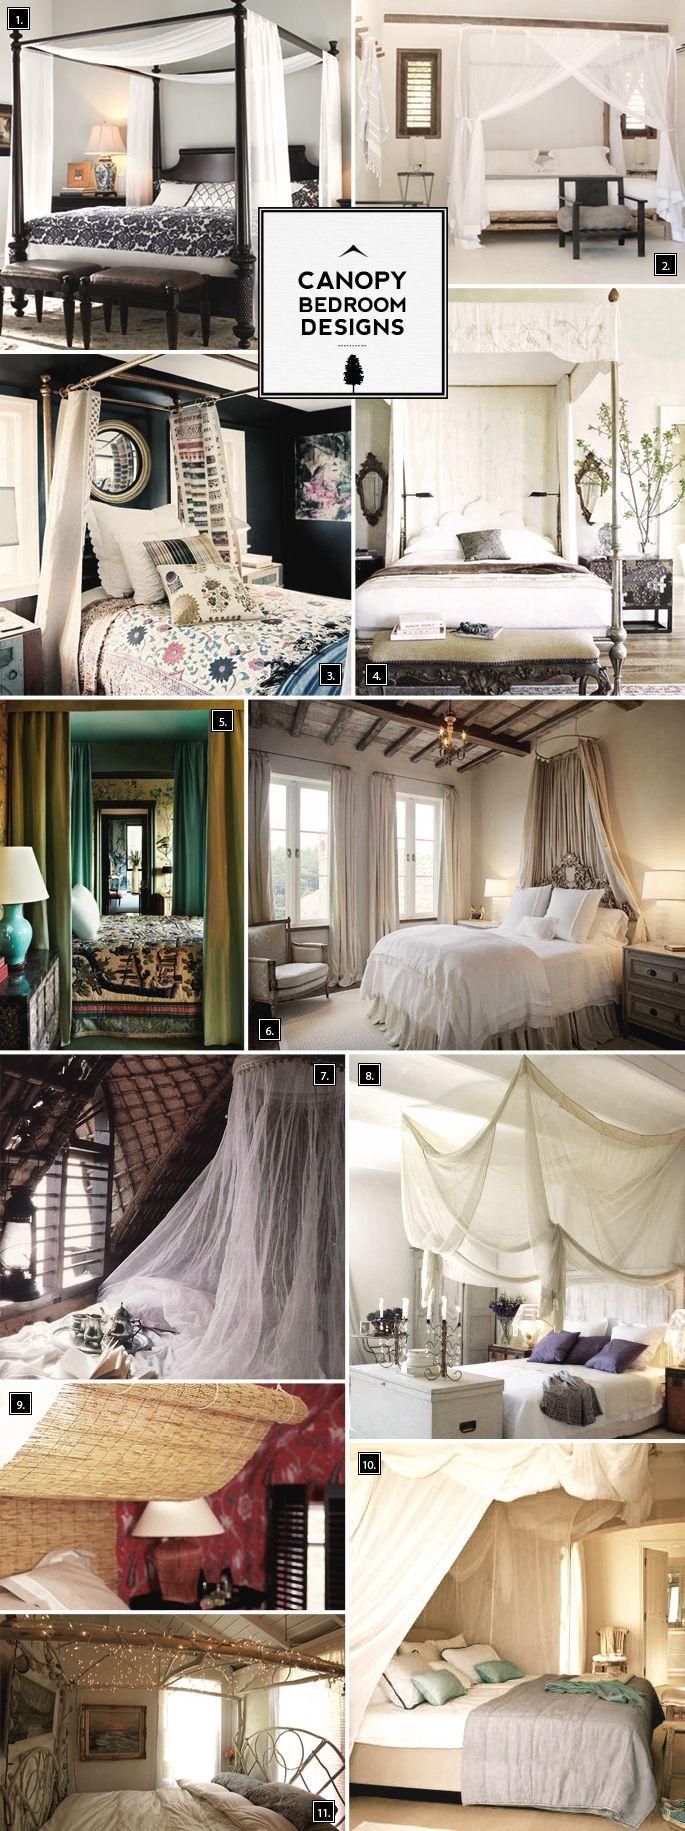 Romantic Ideas: Canopy Bedroom Designs